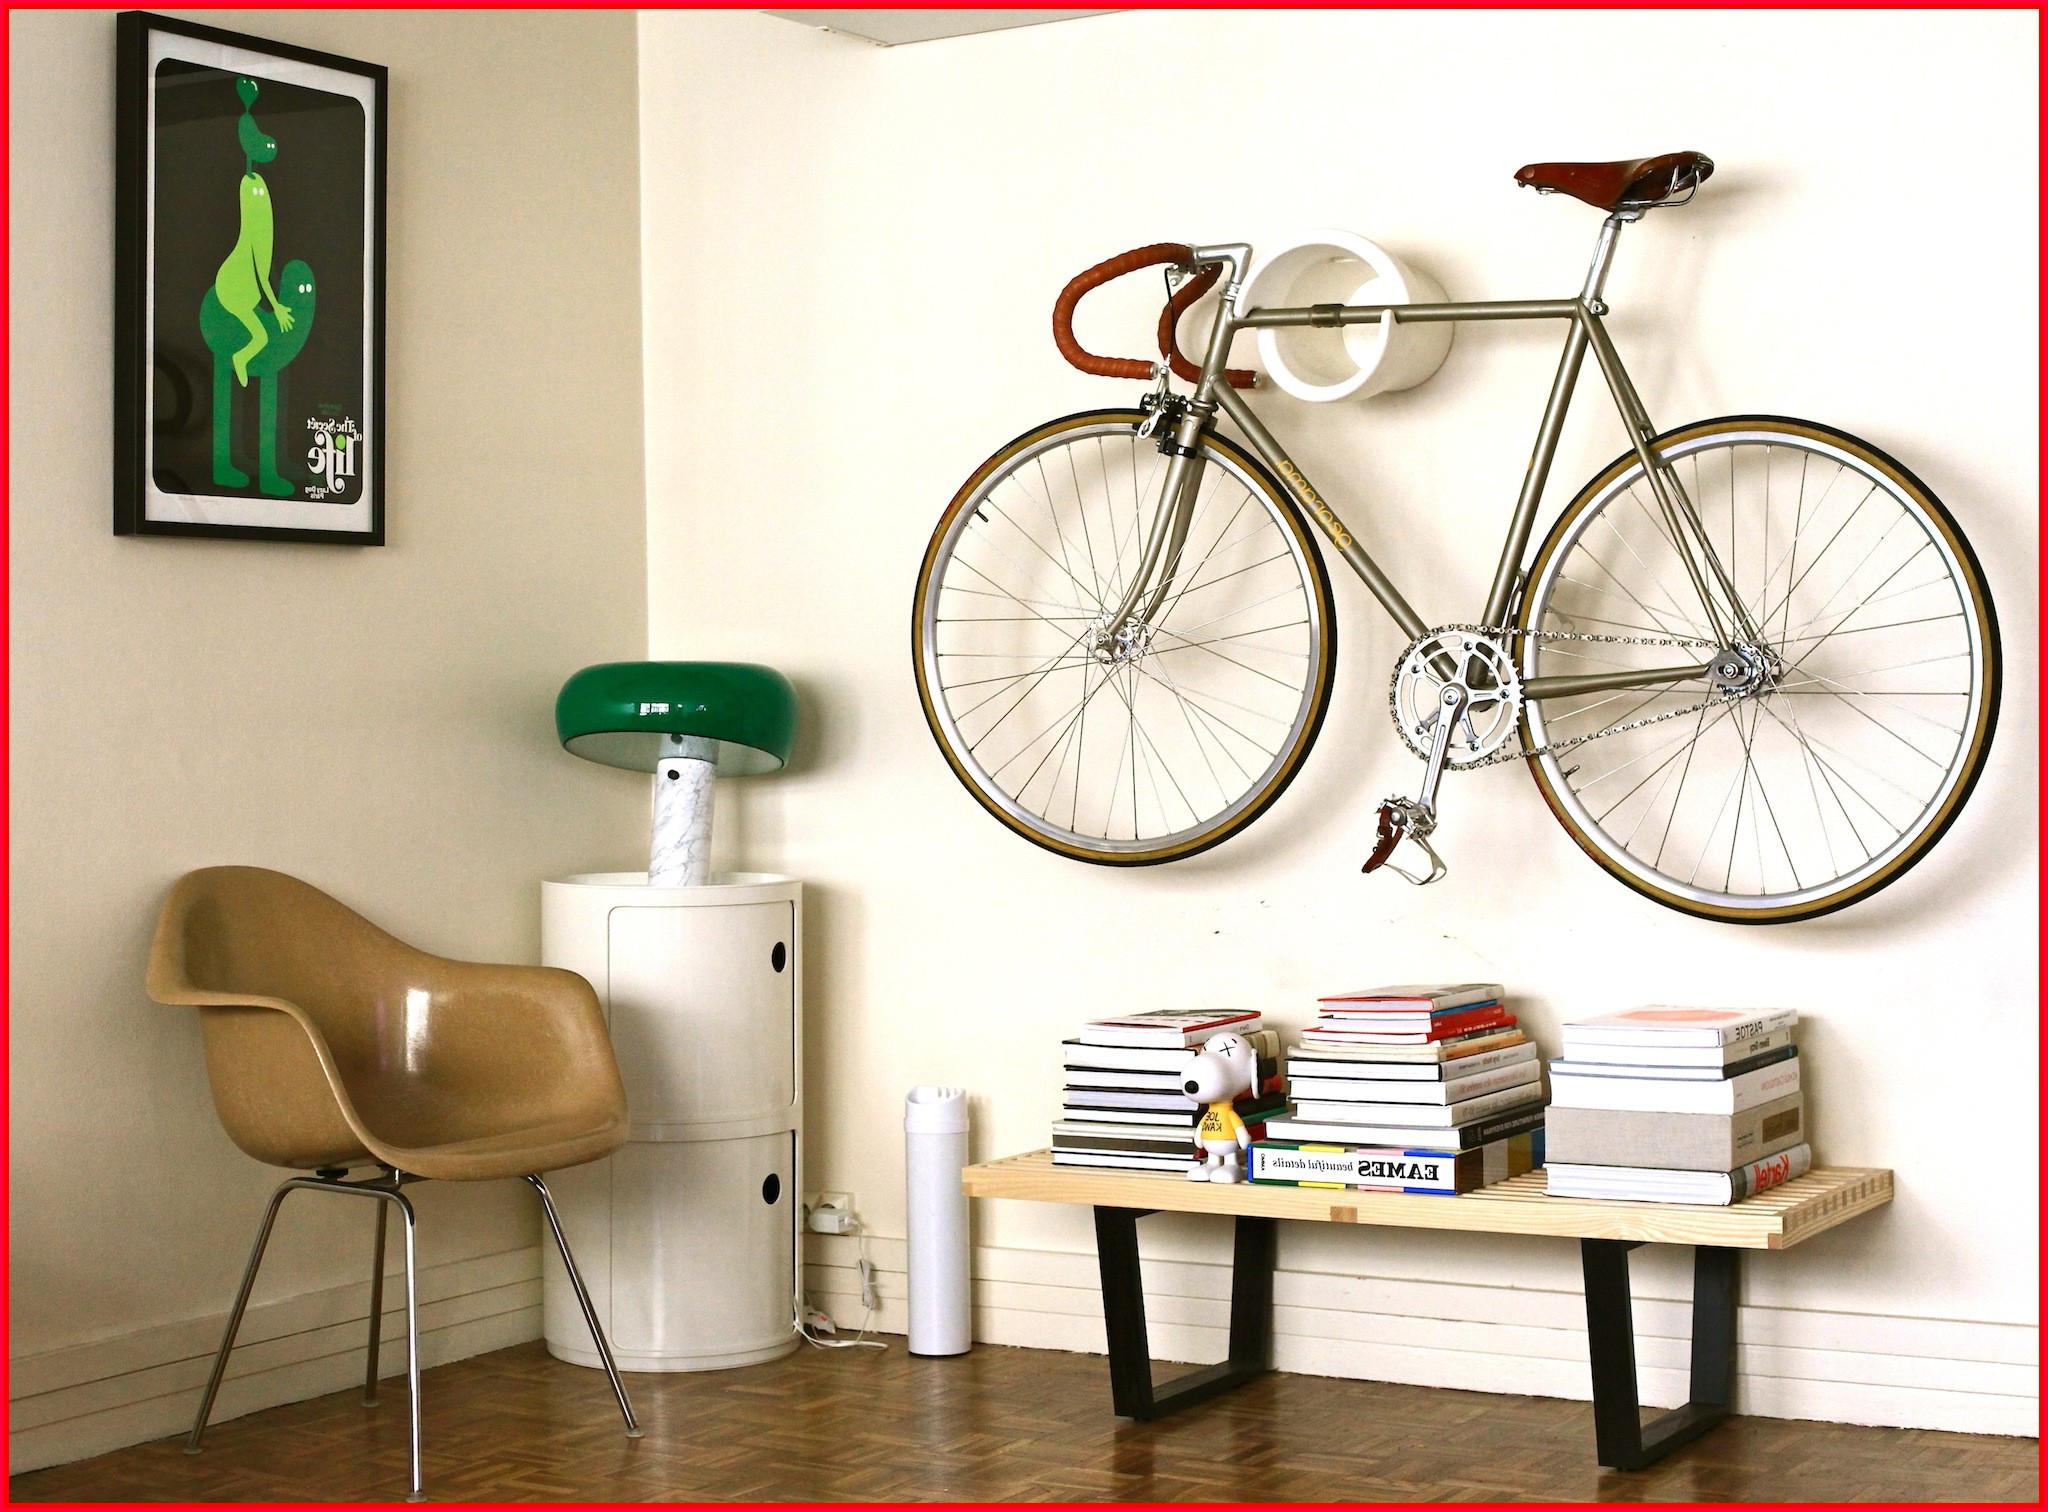 Muebles De Baño Online Outlet O2d5 Elegante Muebles Diseà O Outlet Coleccià N De Muebles Idea